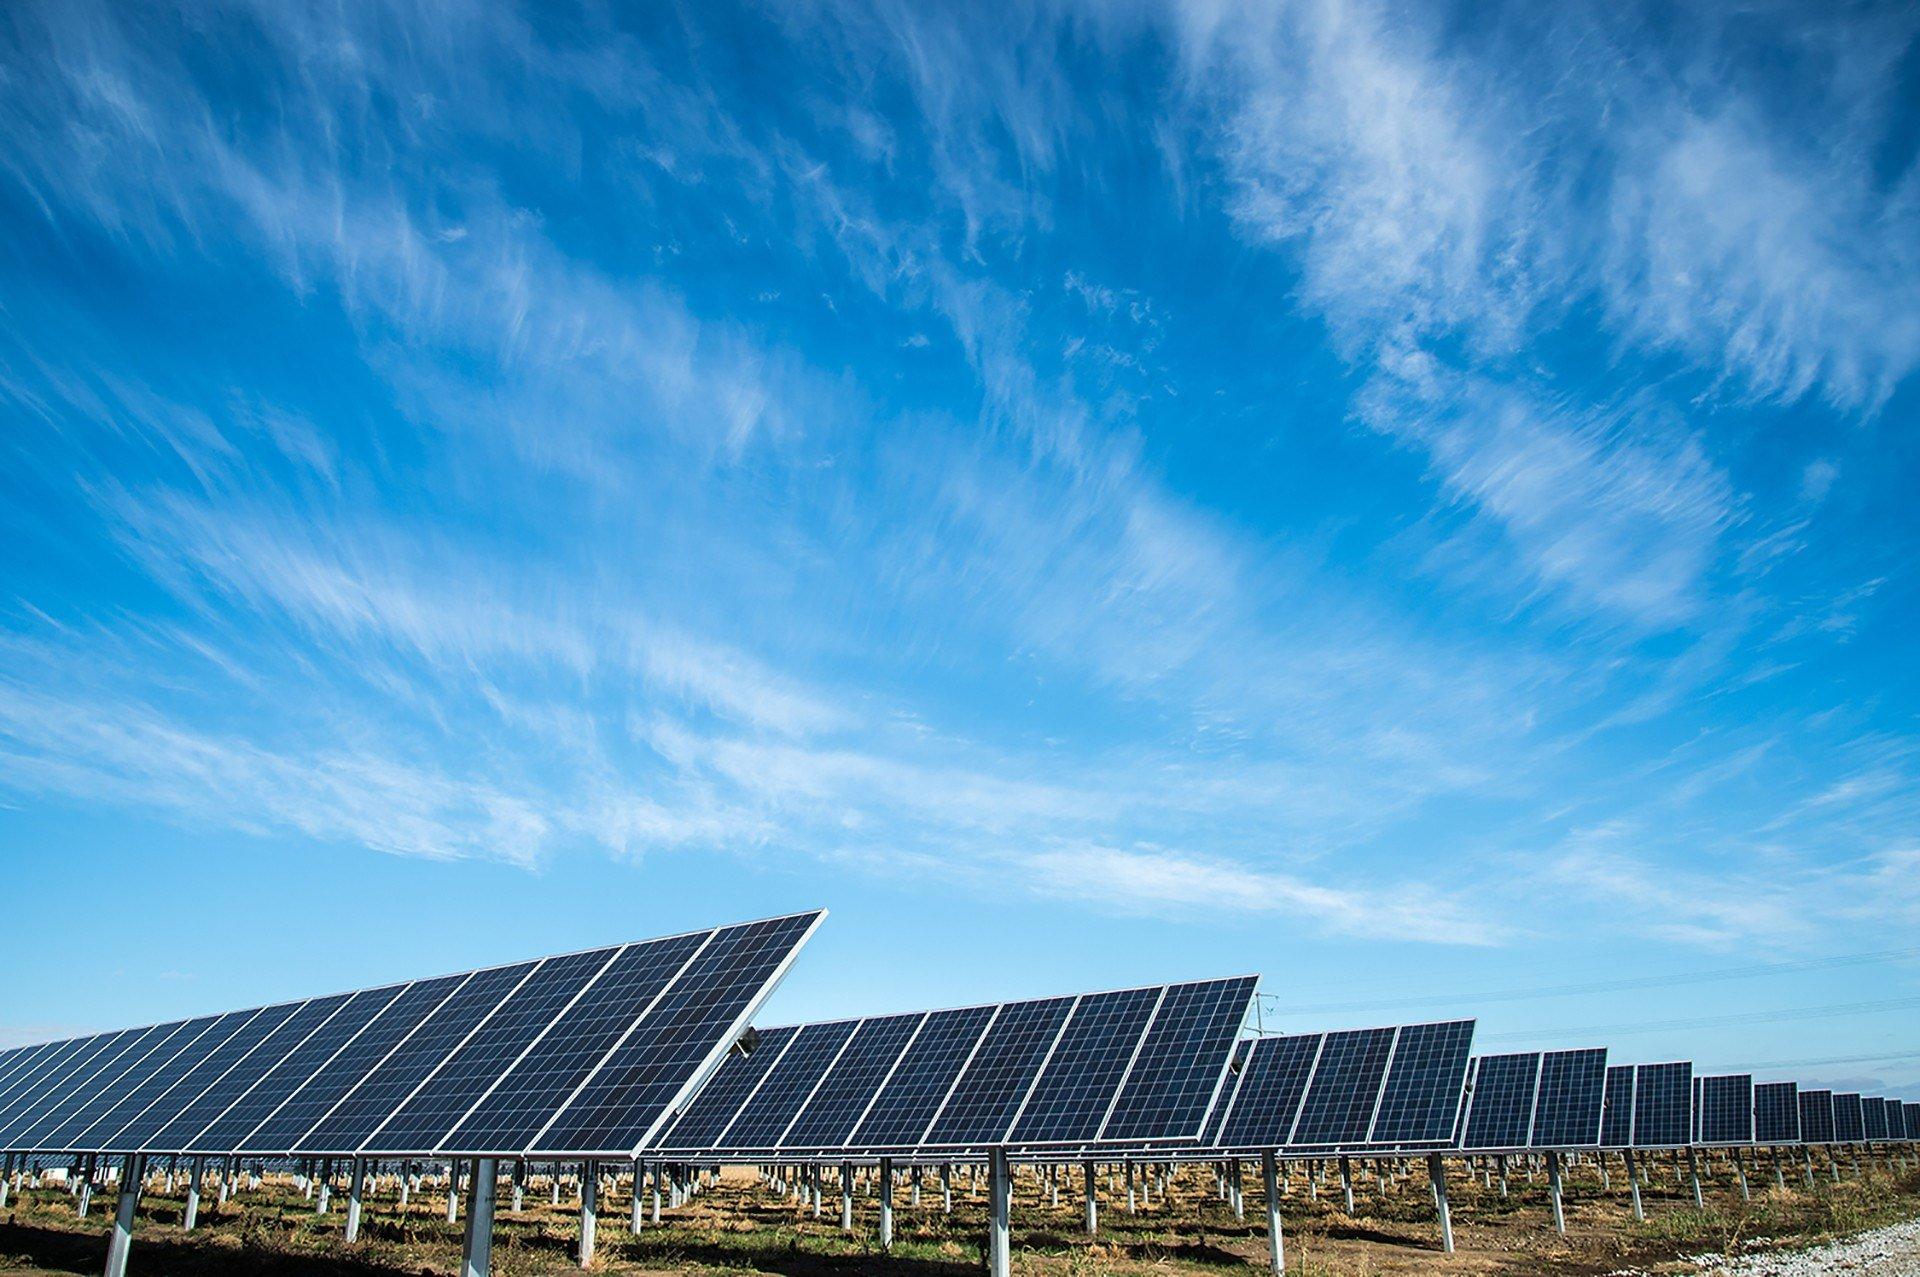 Saunders County approves solar farm construction near Yutan